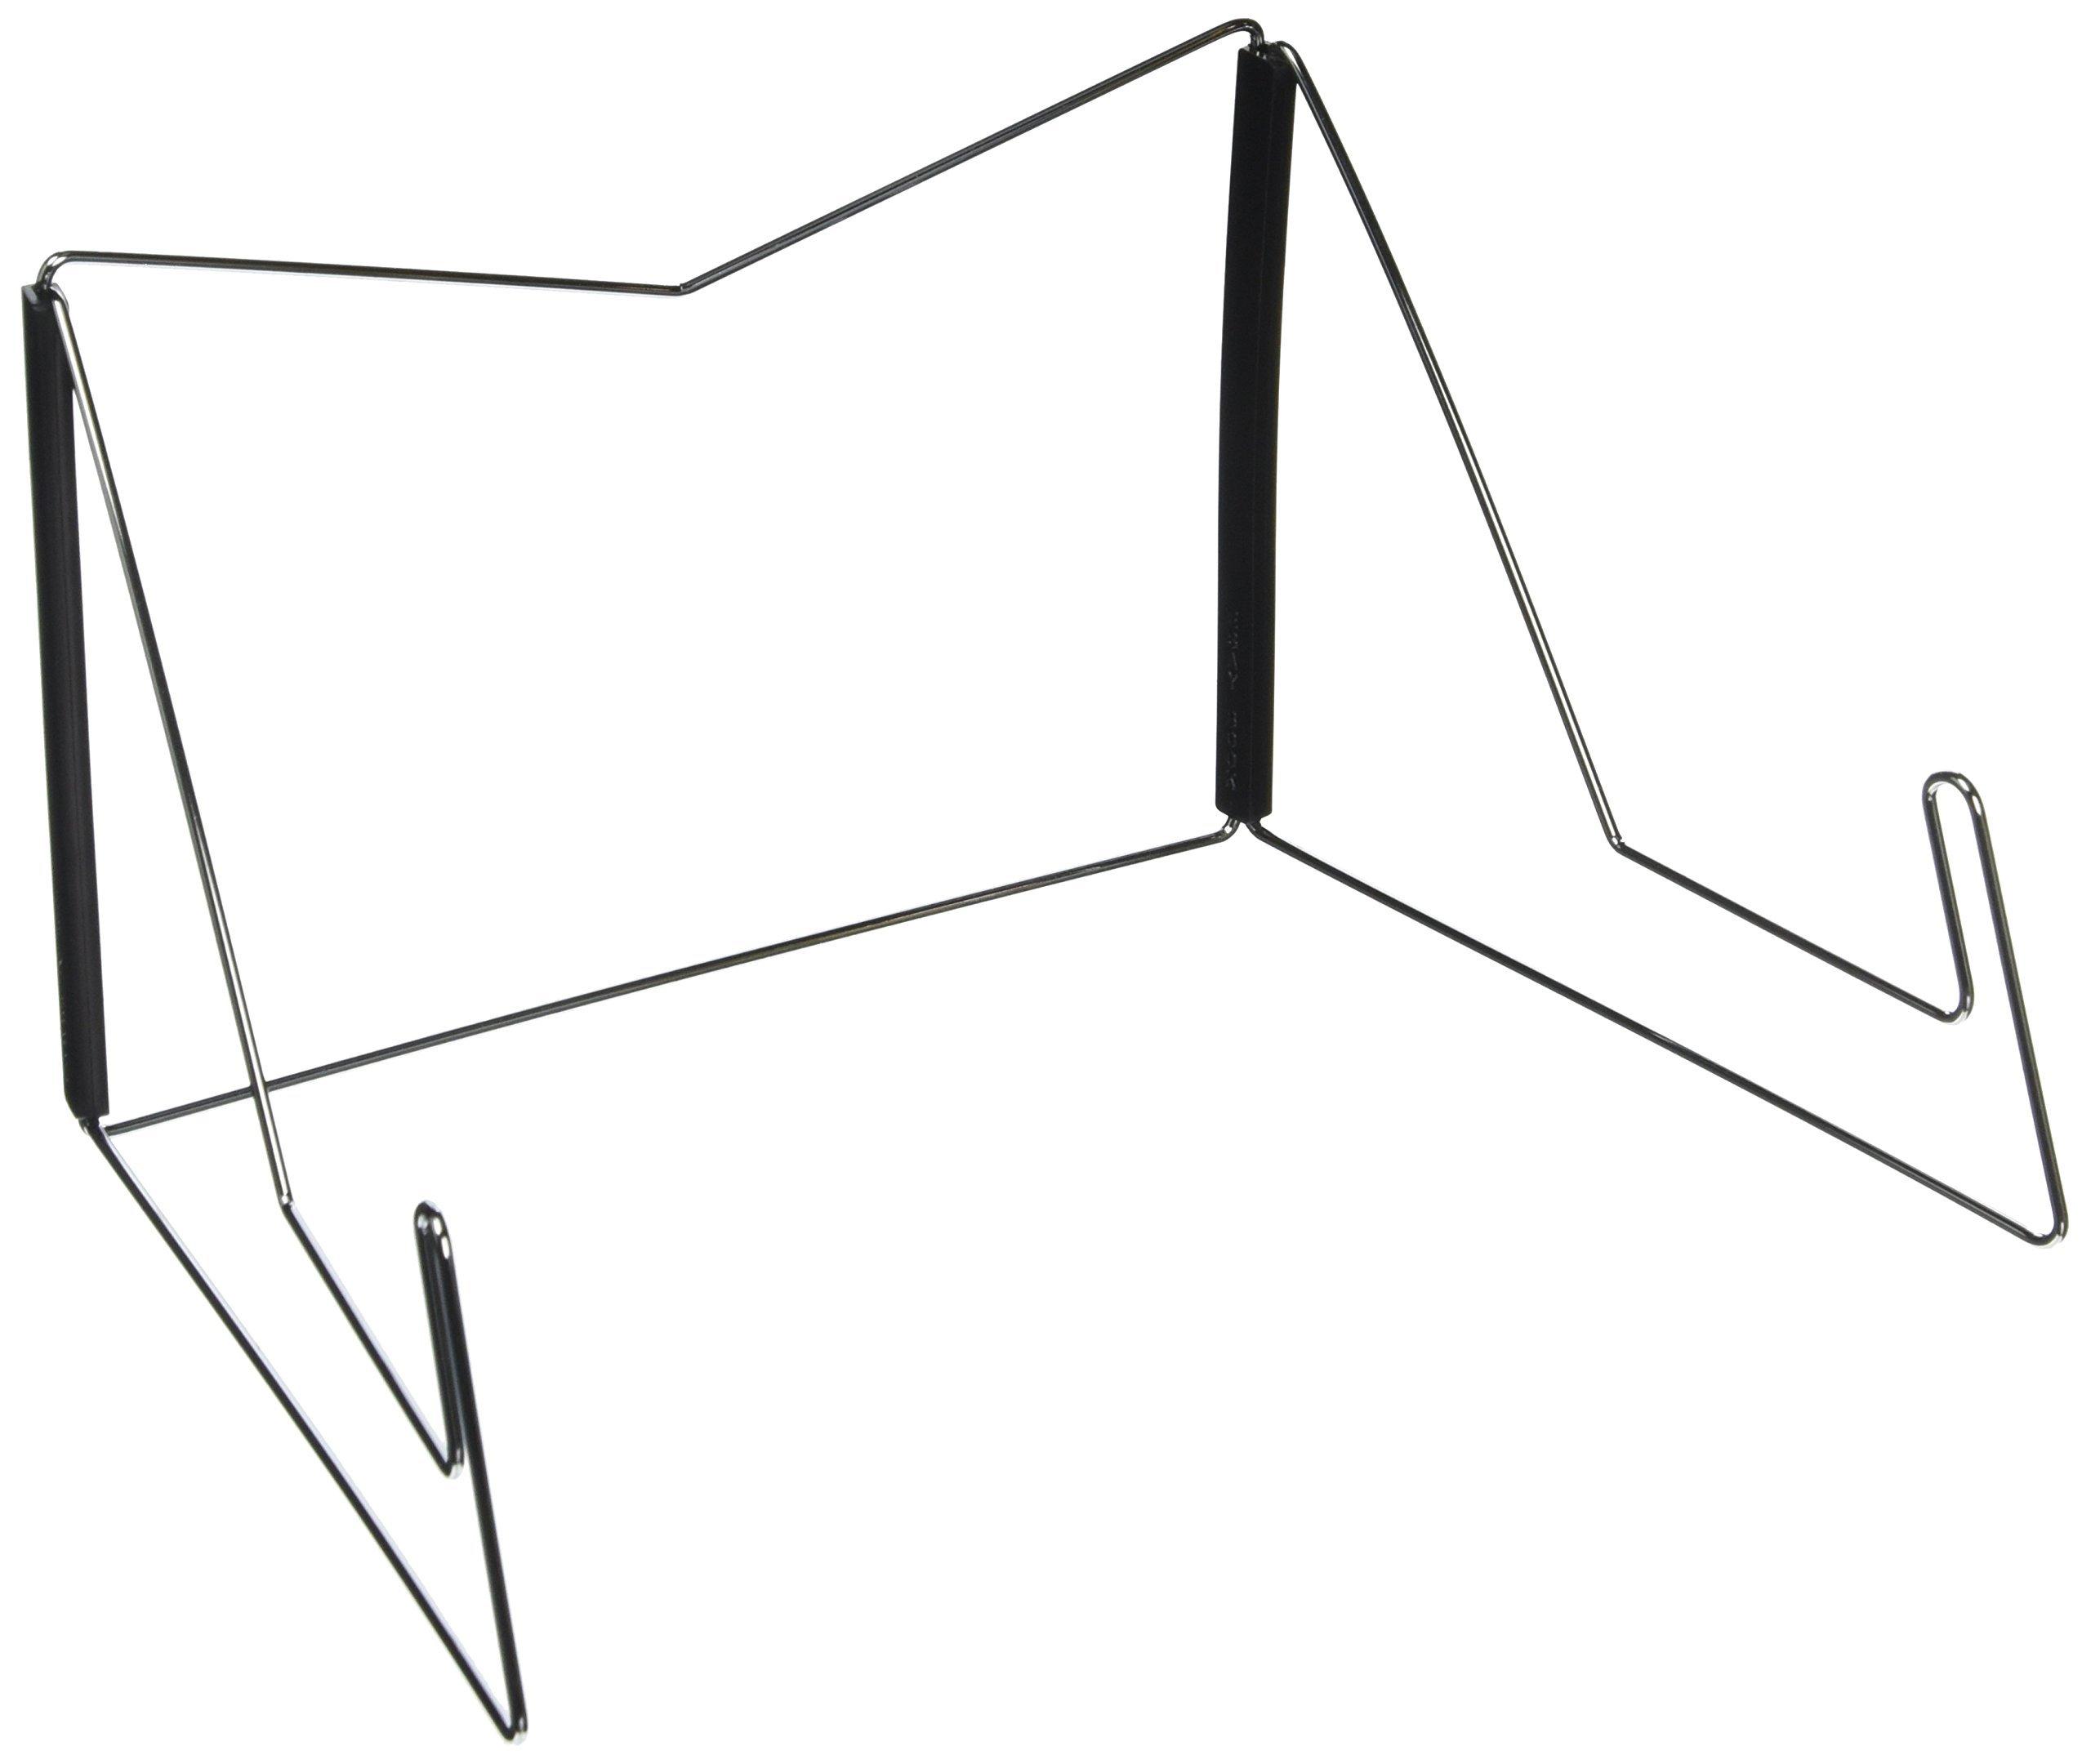 OliaDesign Fold-n-Stow Book Stand, Black